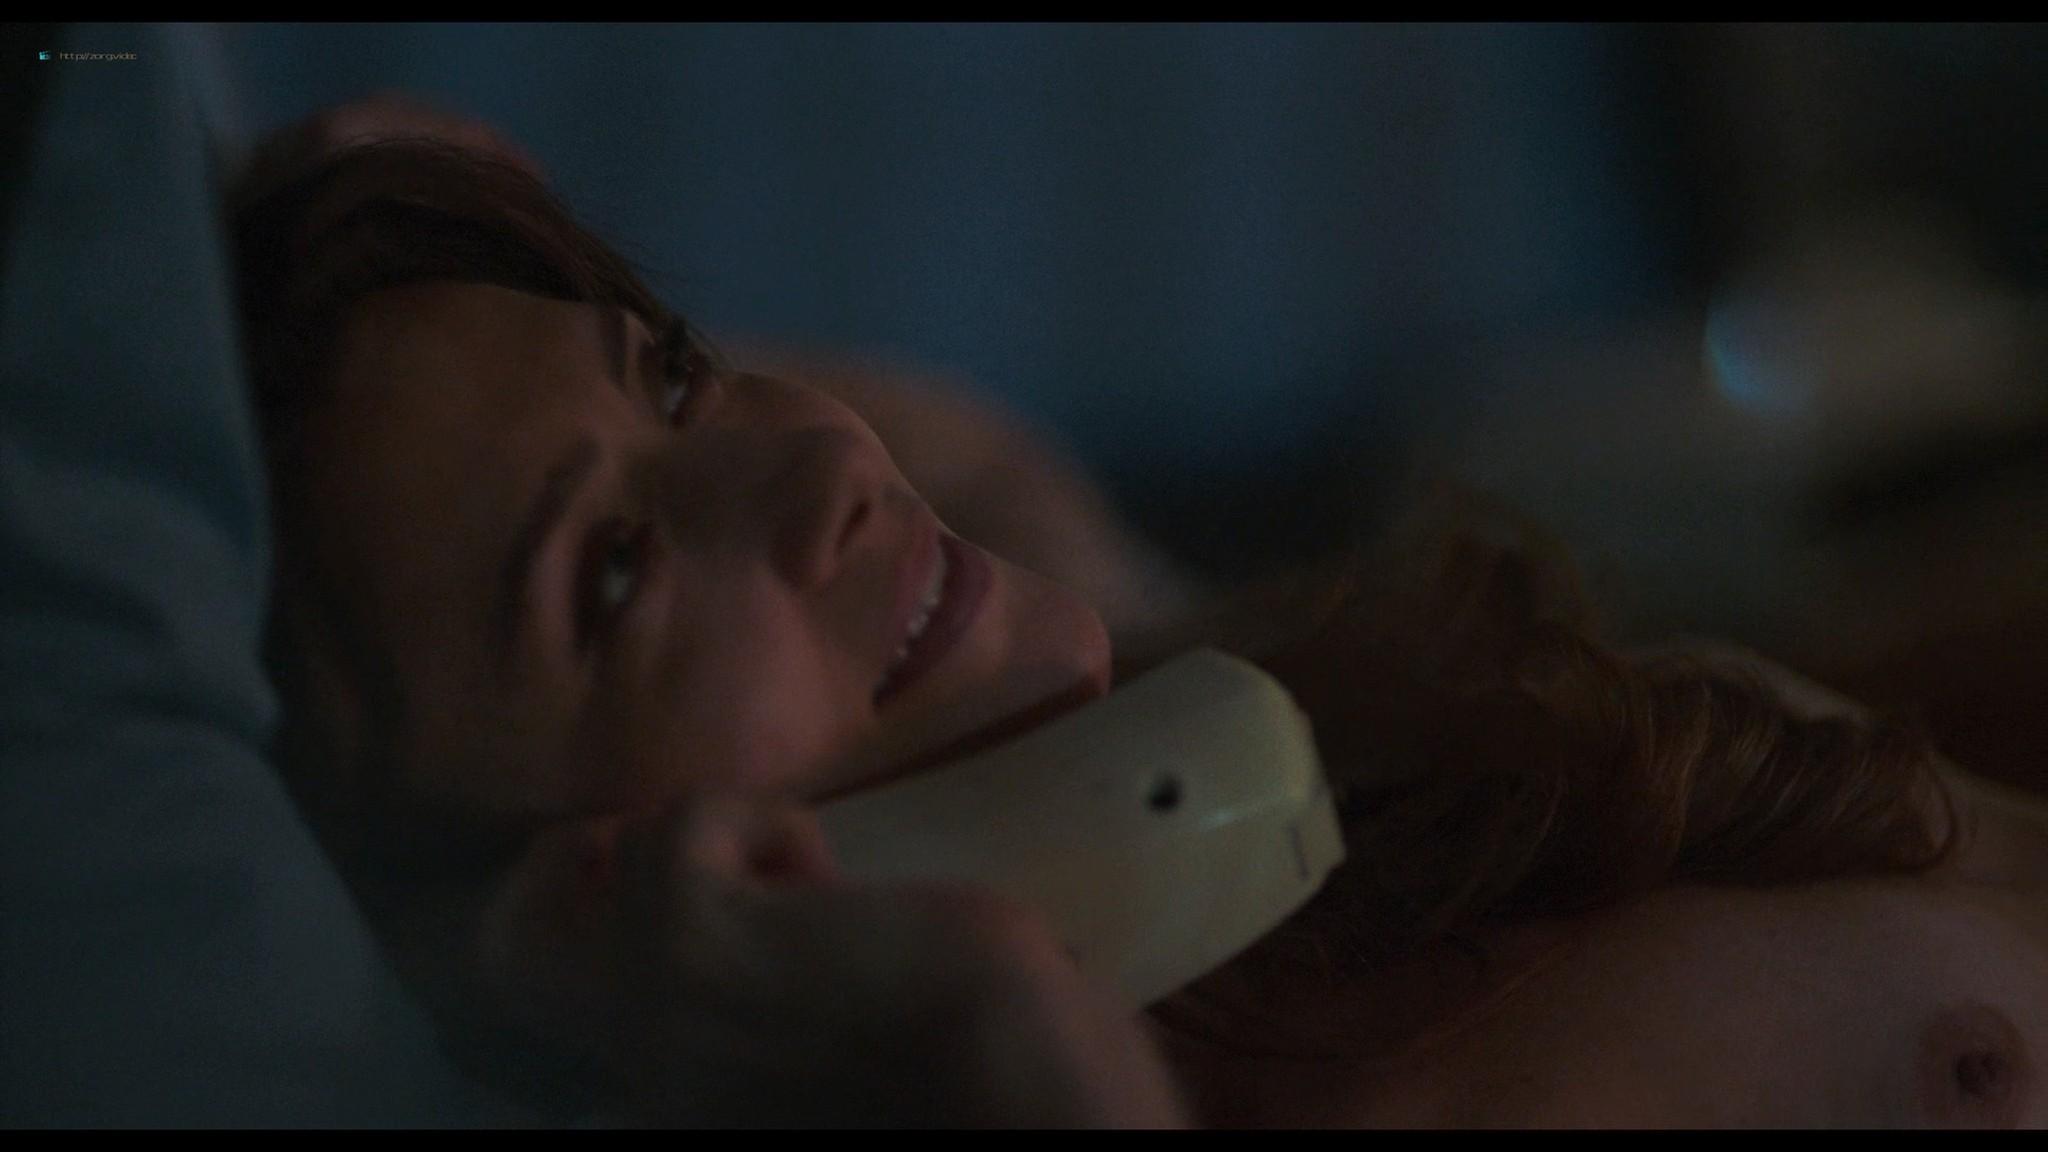 Maria Fernanda Cândido nude Marilina Marino nude sex - The Traitor (2019) HD 1080p BluRay (9)